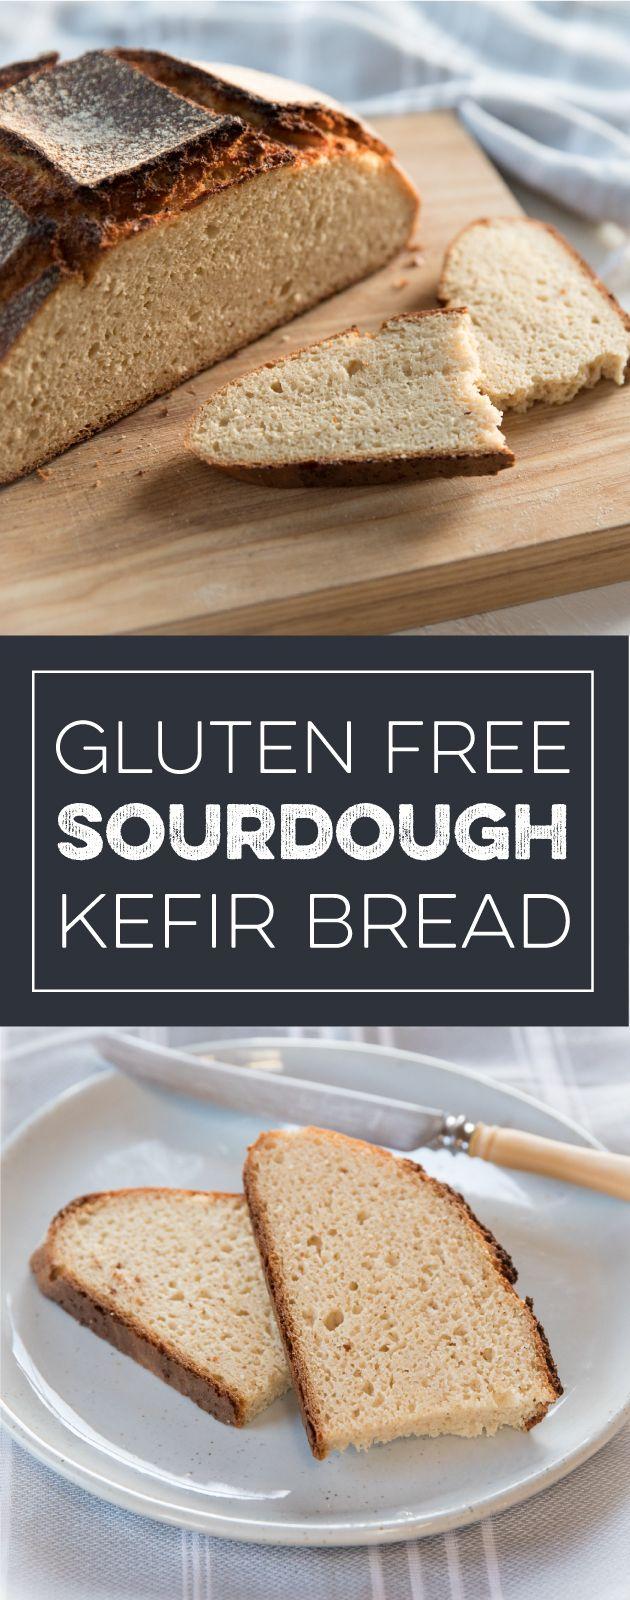 Gluten Free Kefir Sourdough Bread Recipe Gluten Free Sourdough Grain Free Bread Recipe Sourdough